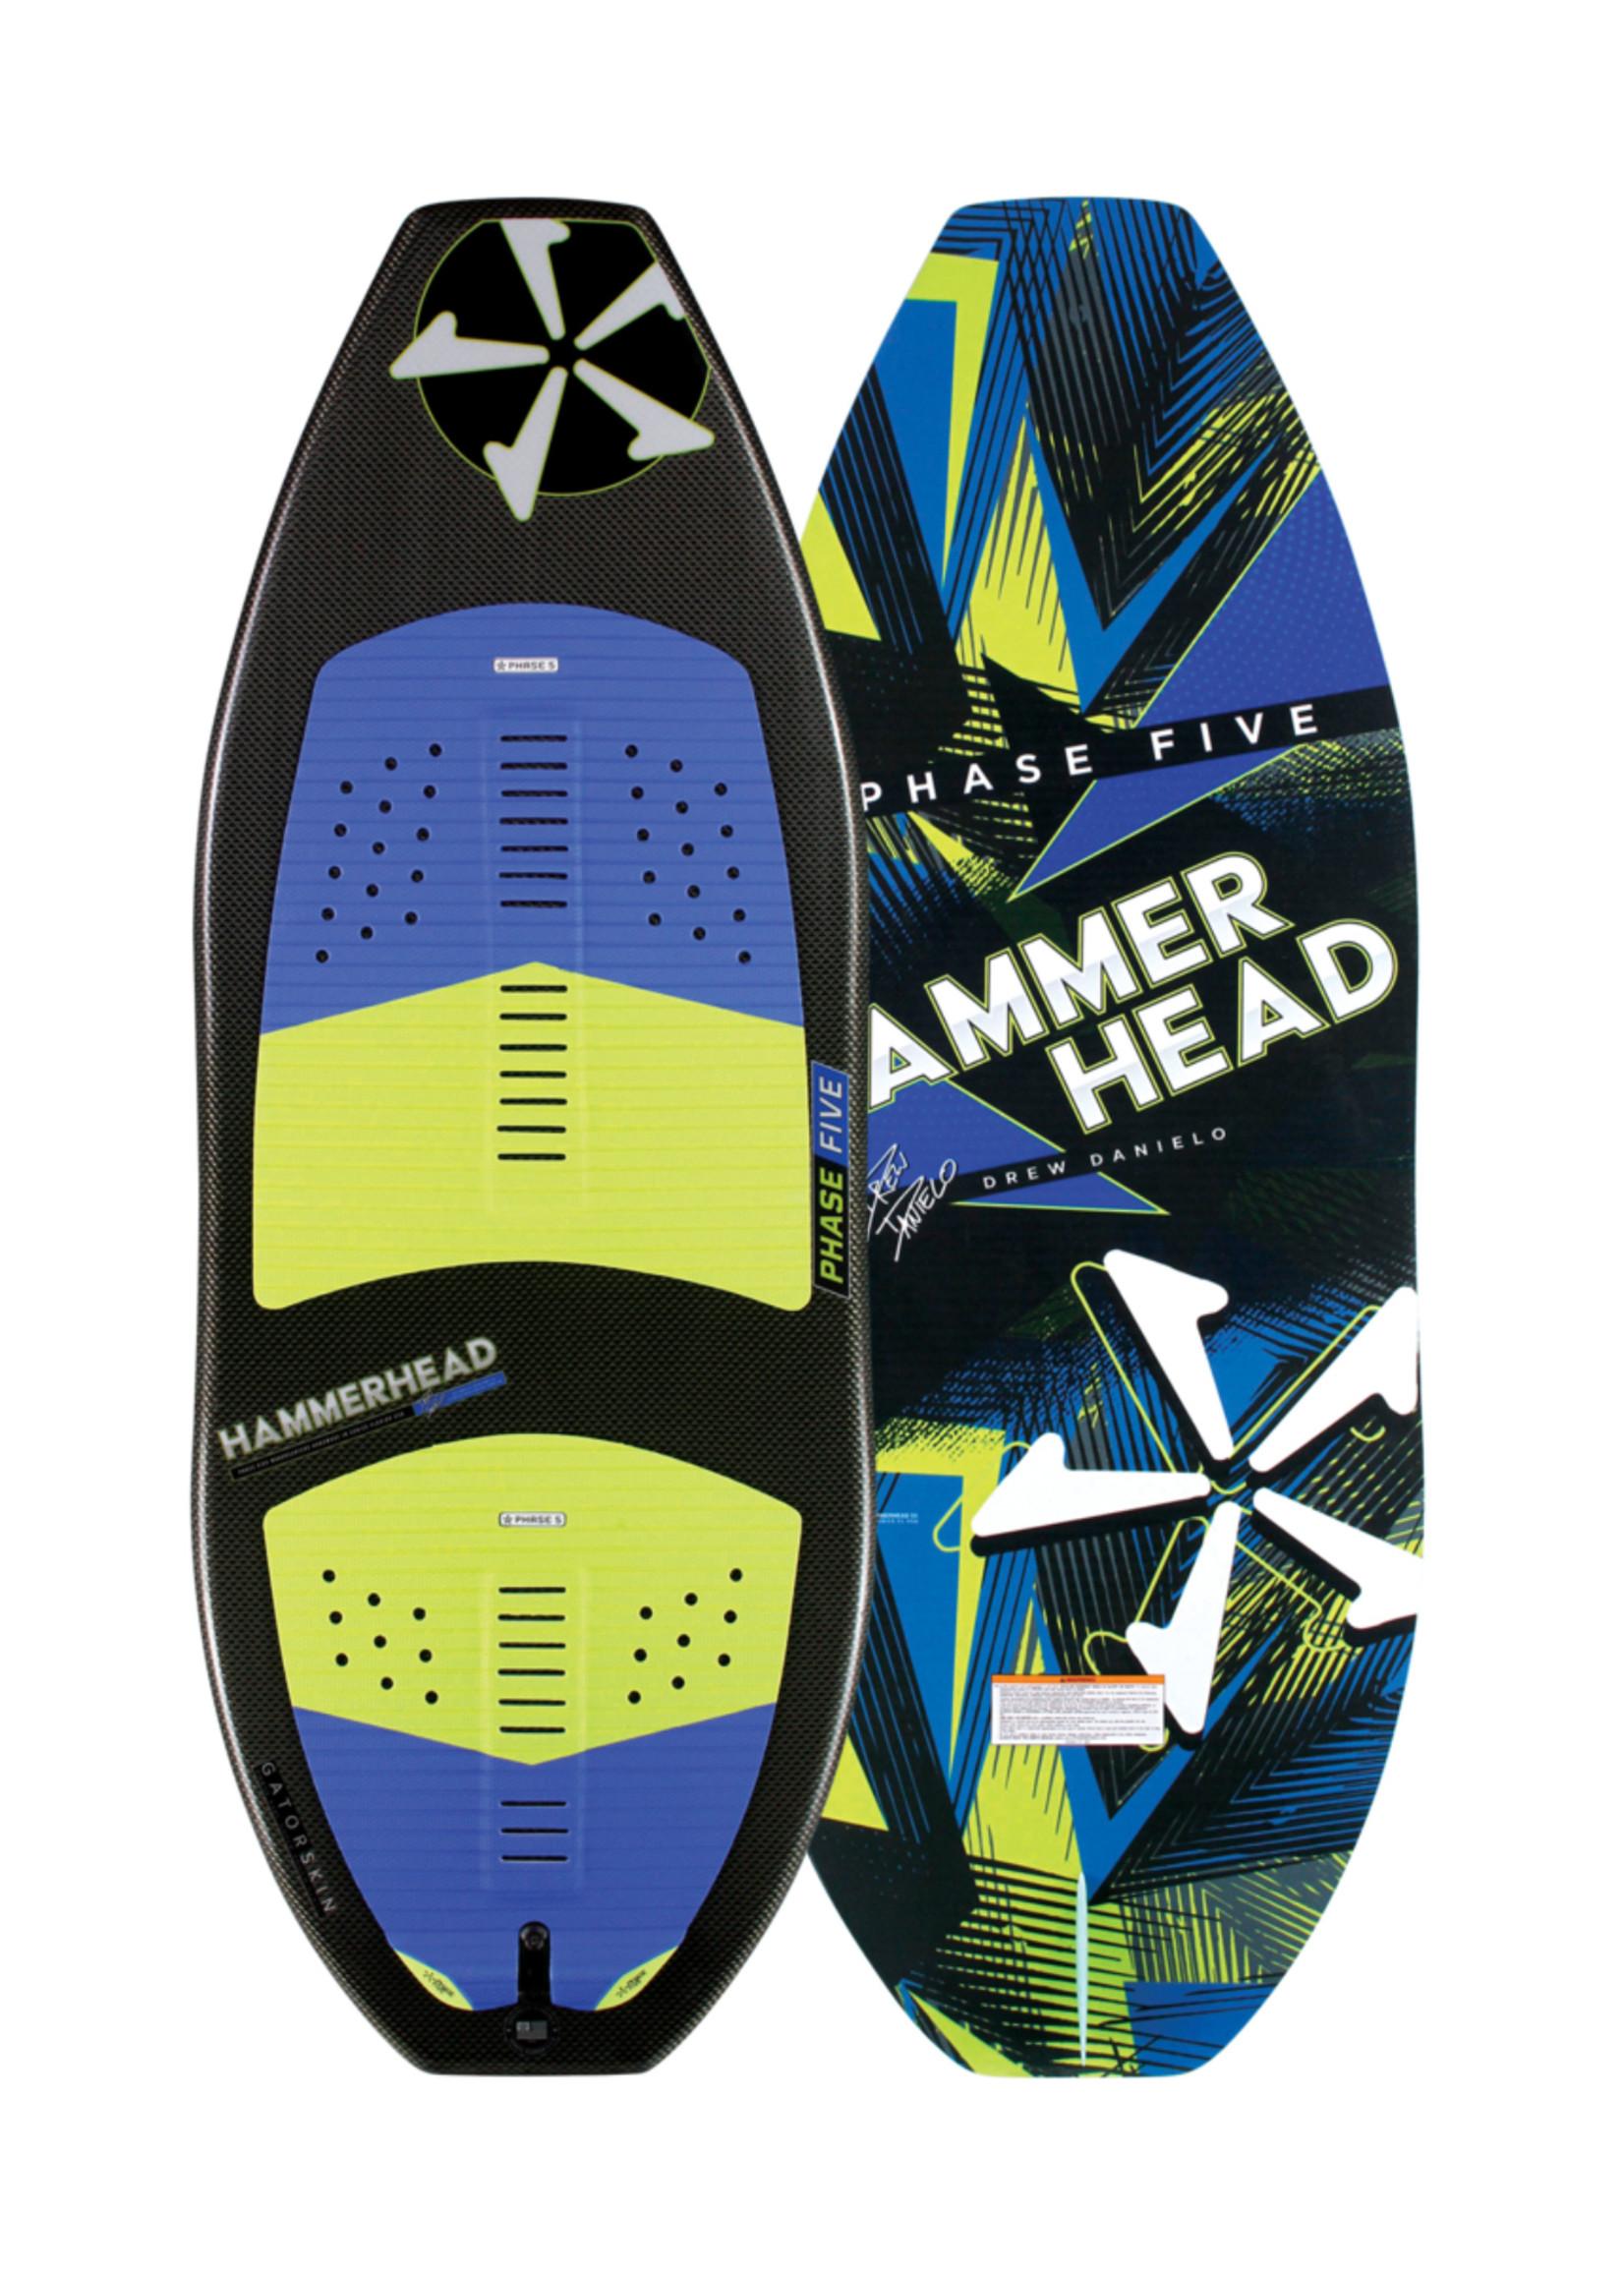 "Phase Five Phase Five Hammerhead 53"" Skim-Style Wakesurf"